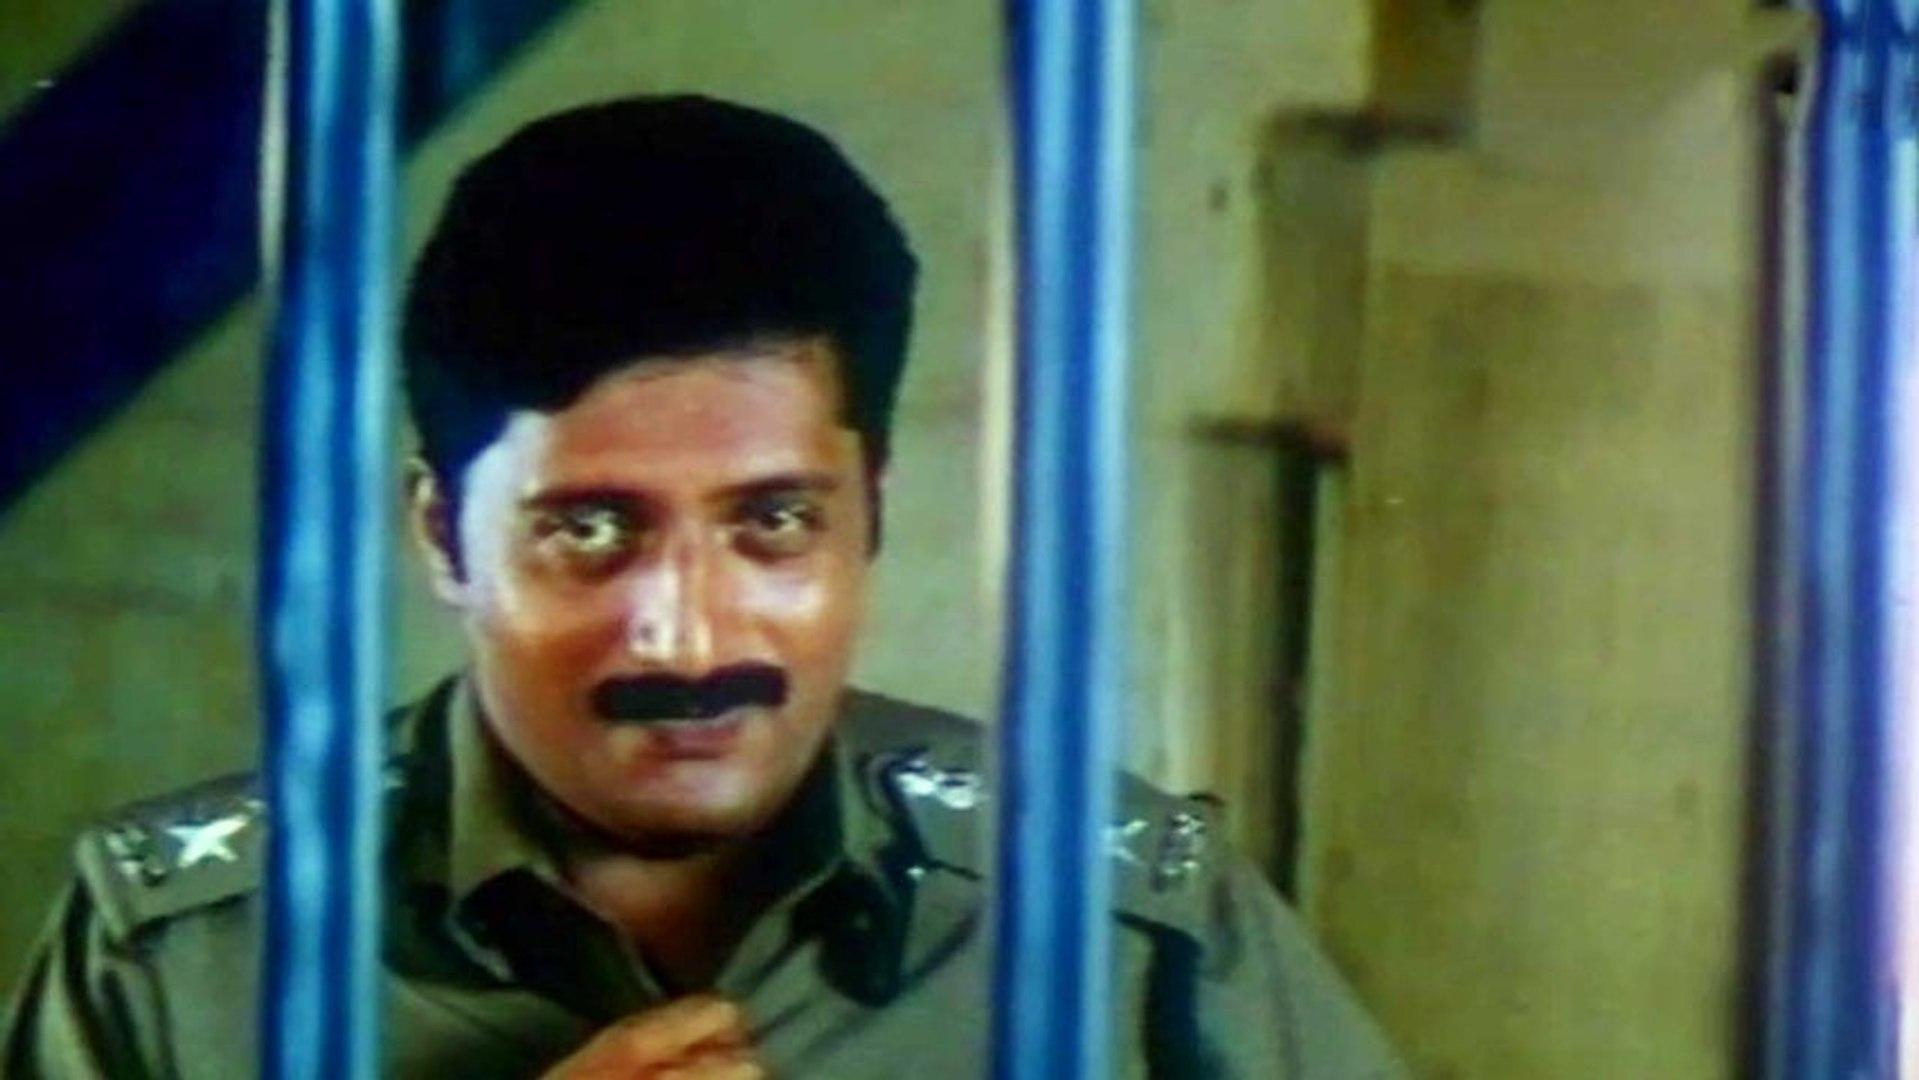 Arjunudu Full Movie - Part 13-14 - Prakash Raj Plan To Encounter Arjun - Arjun, Abhirami, Prakash Ra